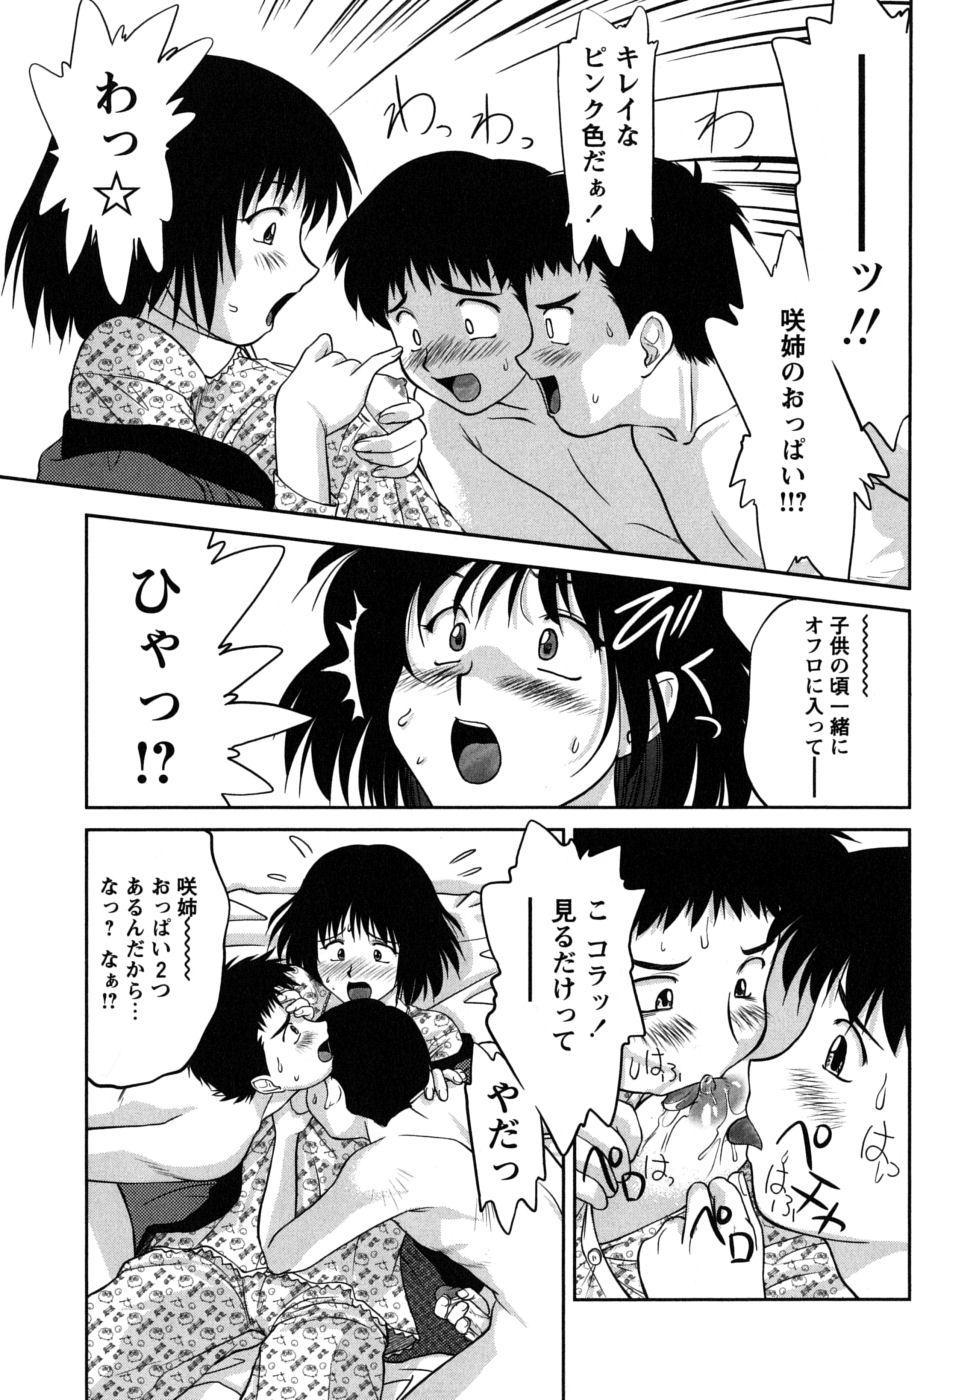 Futa Go Ecchi 72